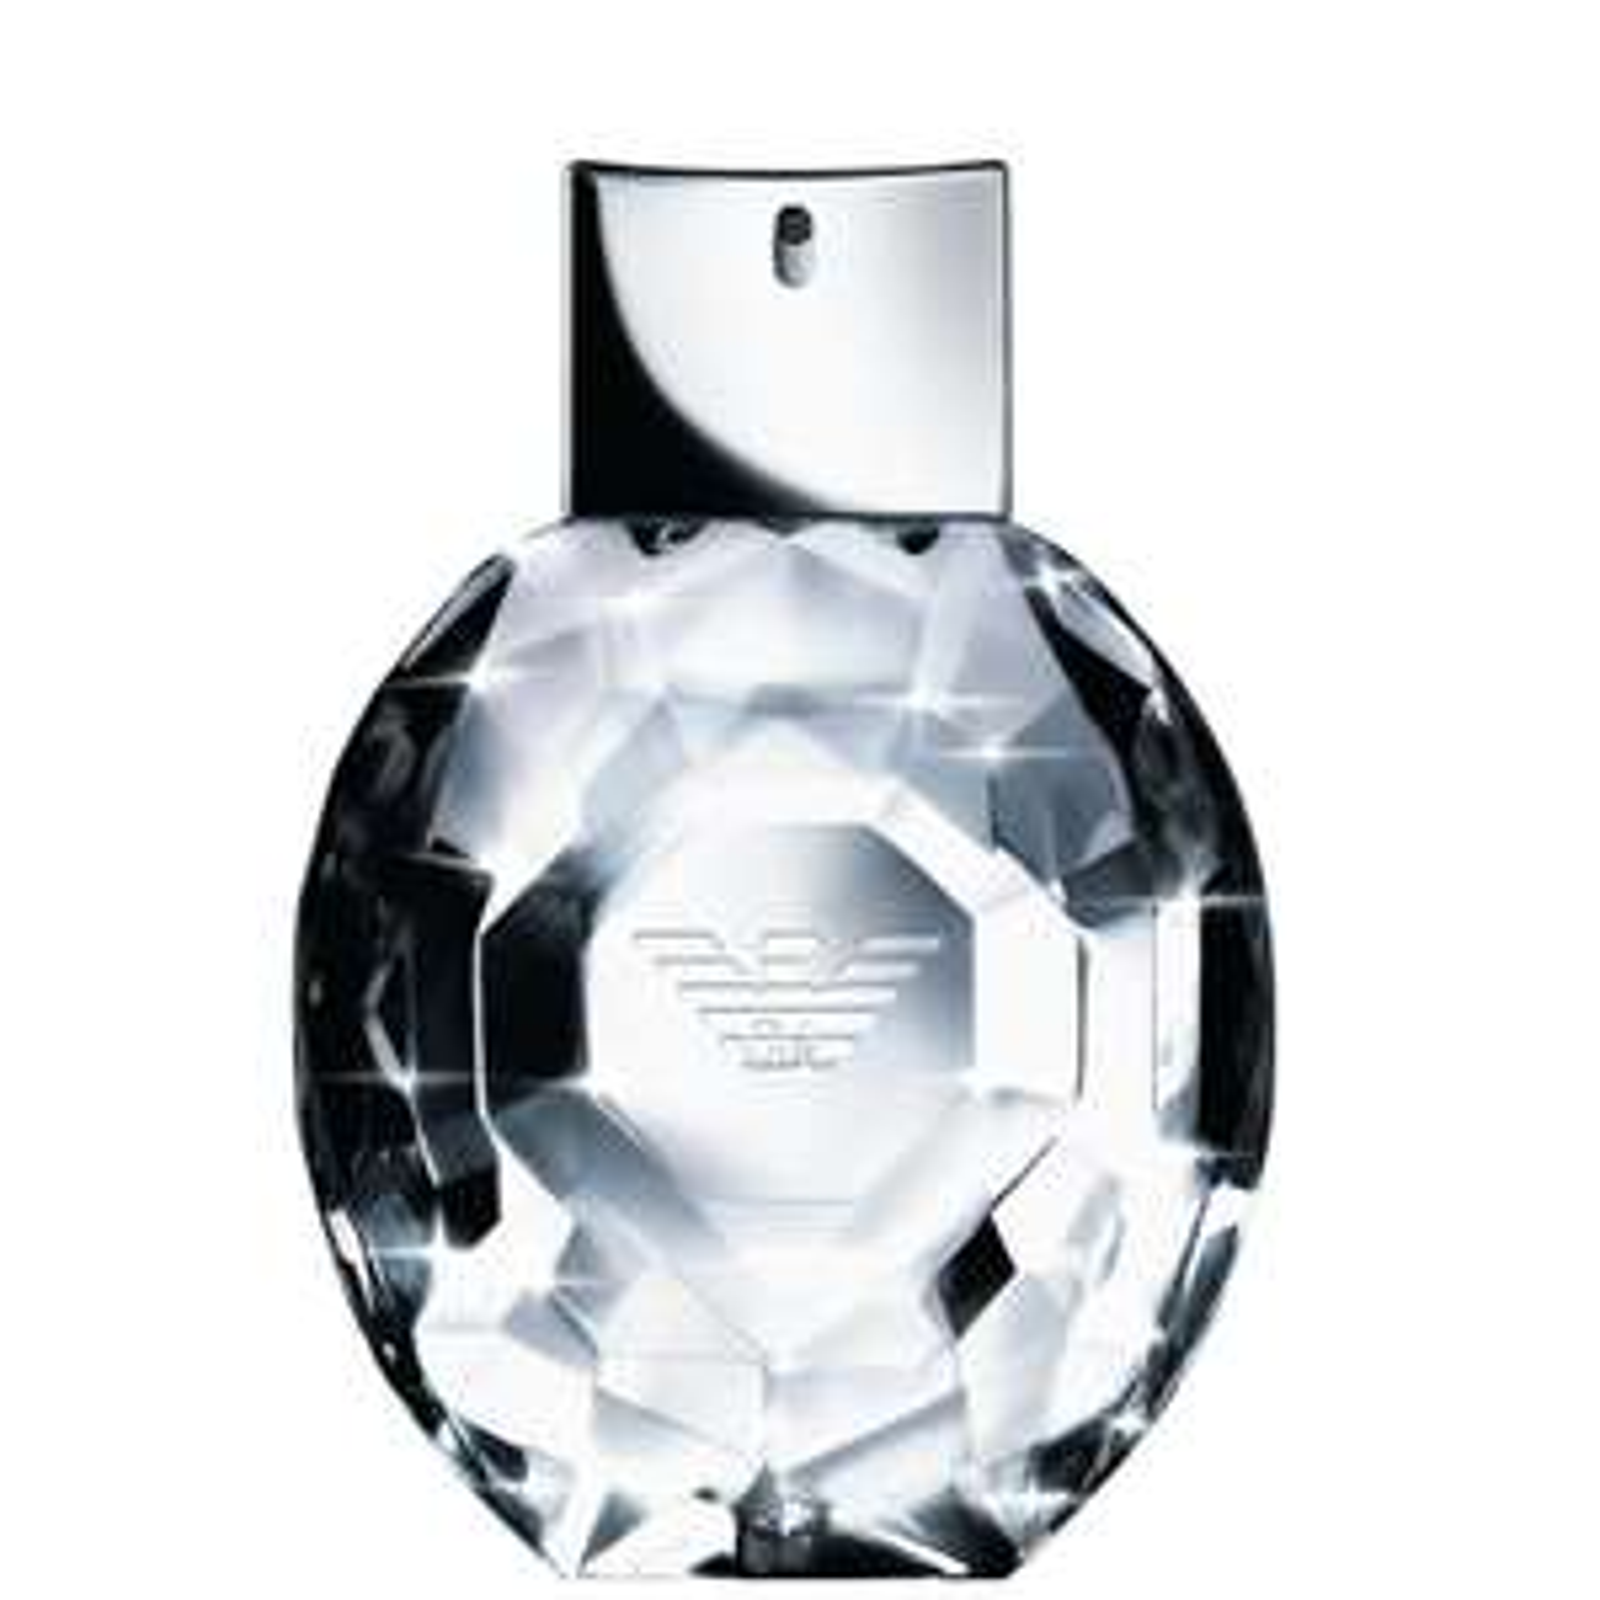 Armani Diamonds EDP 50ml - £29.99 @ Boots Shop